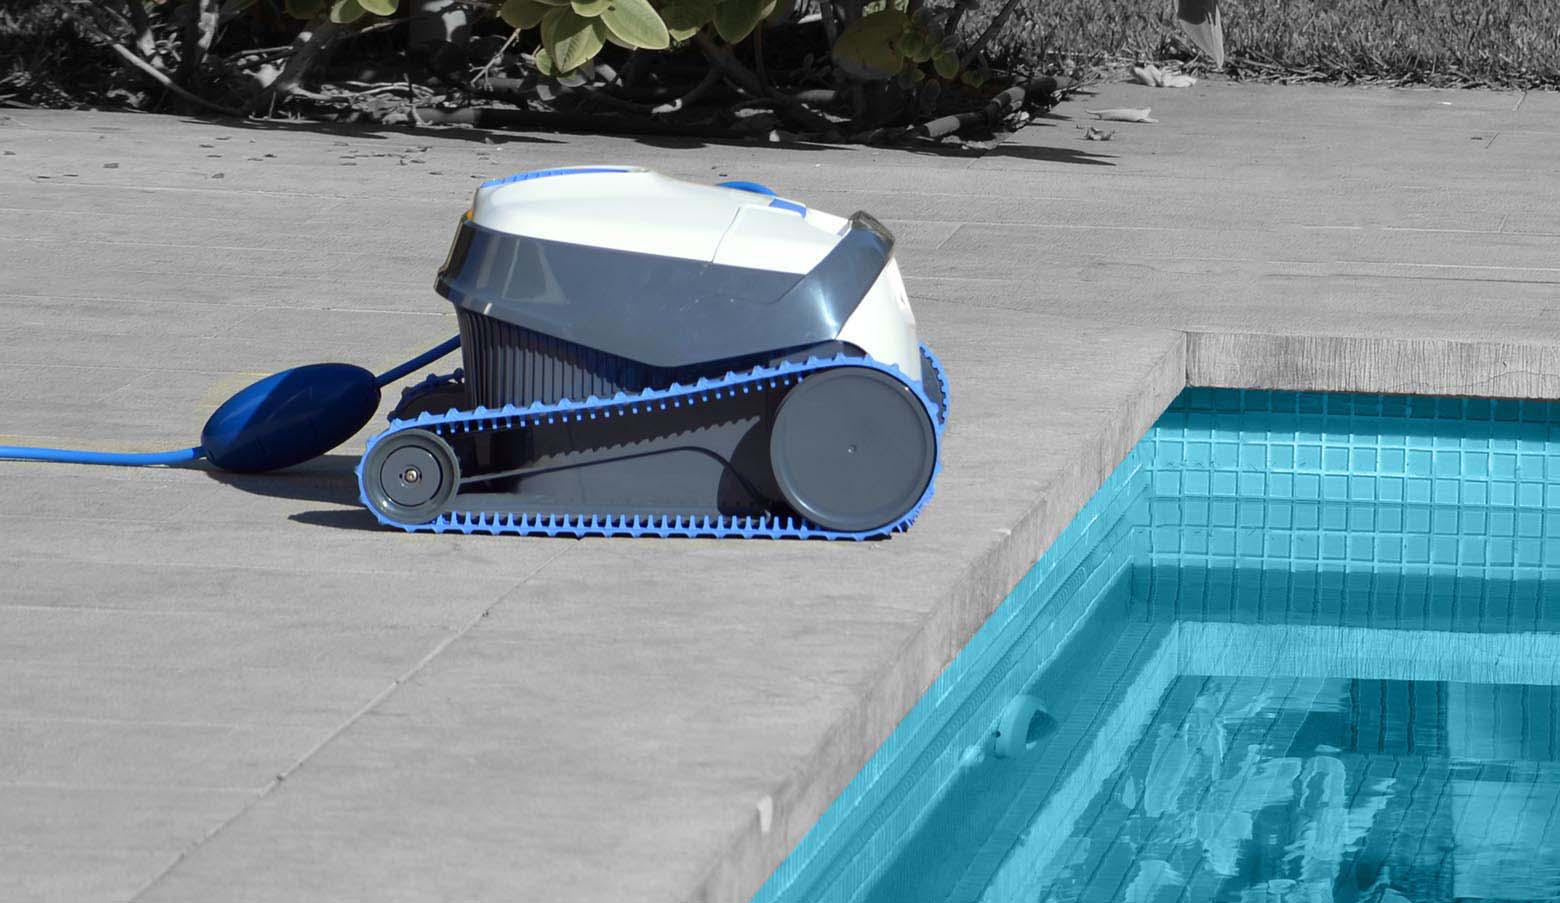 Robot Dolphin S200 - Bella Piscines, Piscines Et Accessoires ... à Robot Piscine Dolphin S200